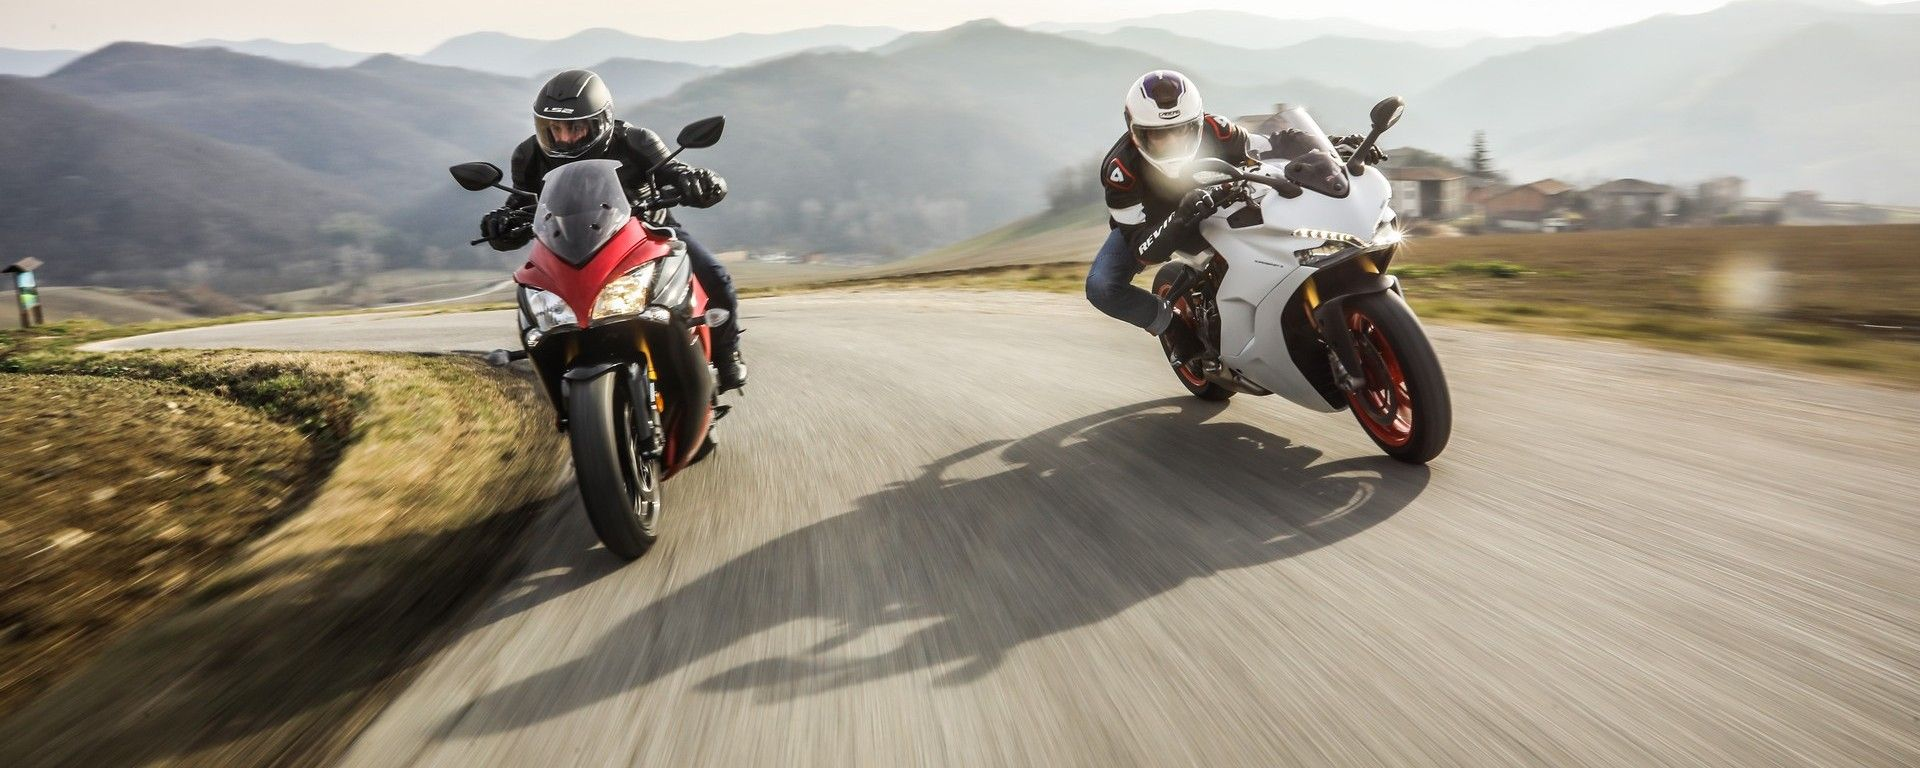 Suzuki GSX-S1000F e Ducati Supersport S